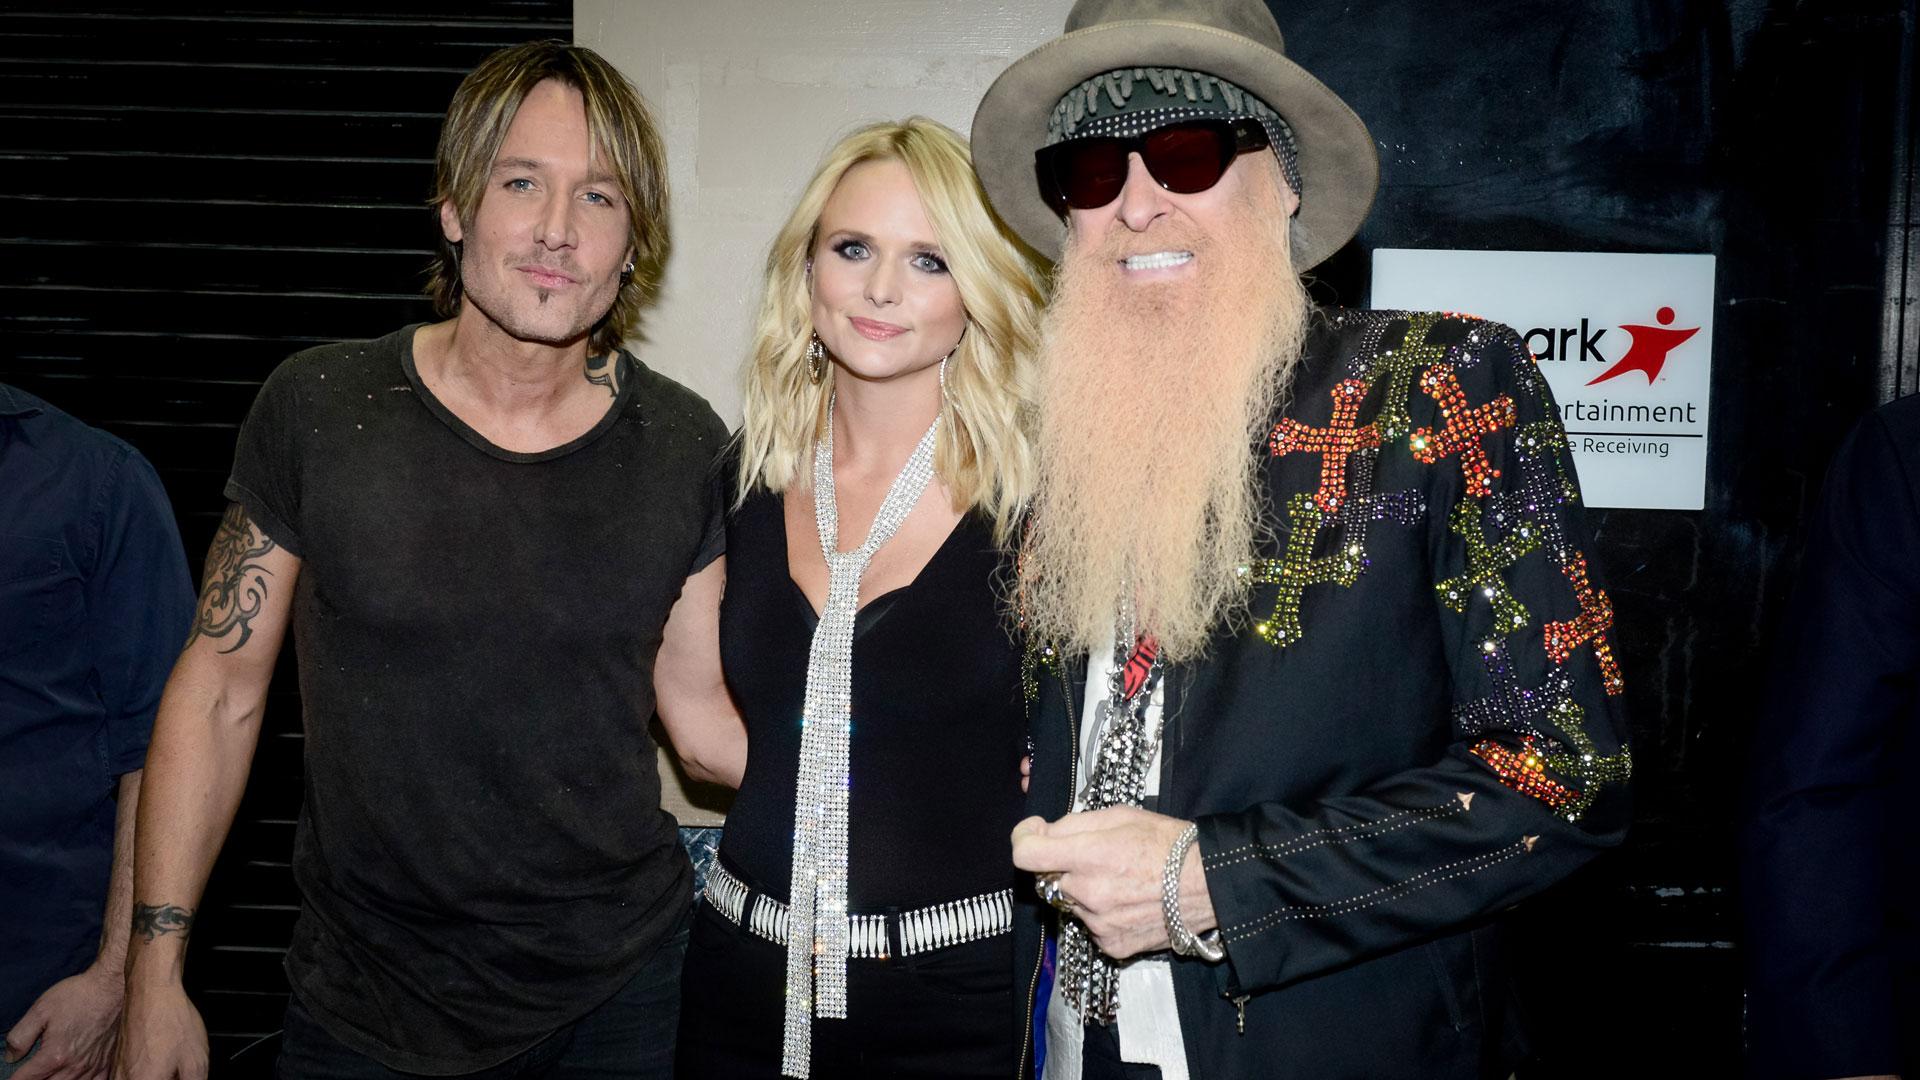 Keith Urban, Miranda Lambert, and ZZ Top guitarist Billy Gibbons hugged backstage before performing